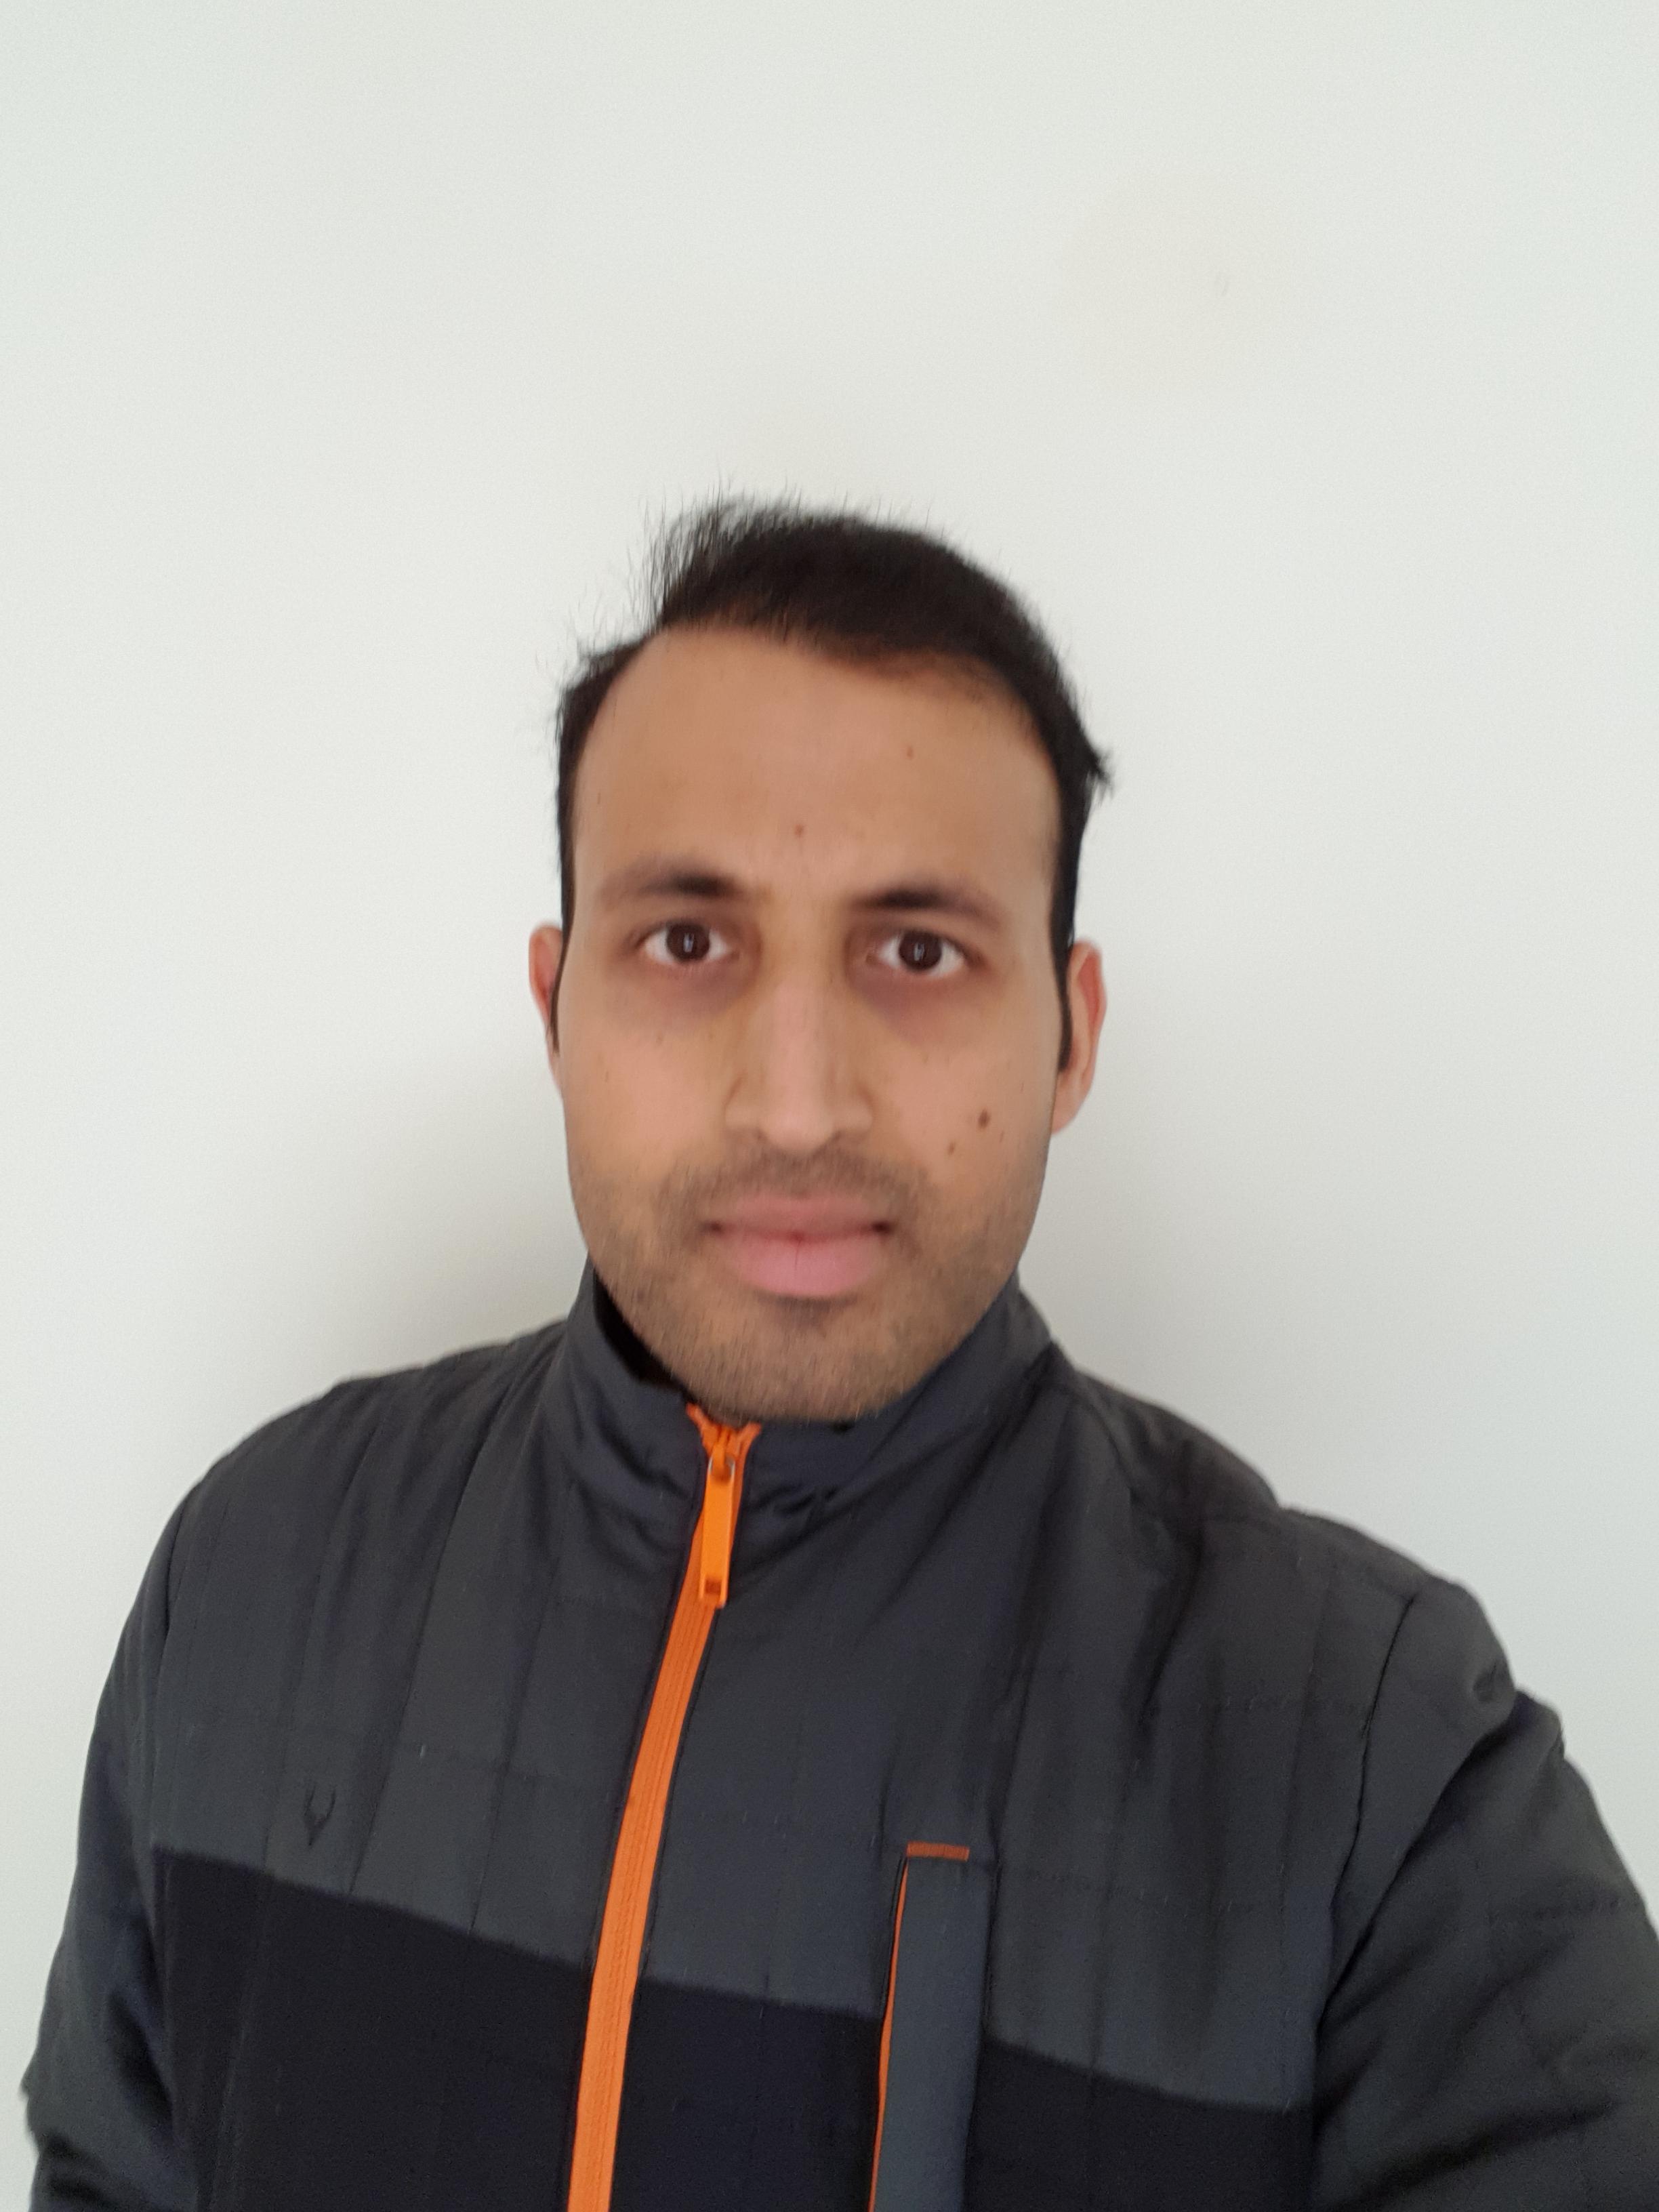 Nipun's profile picture